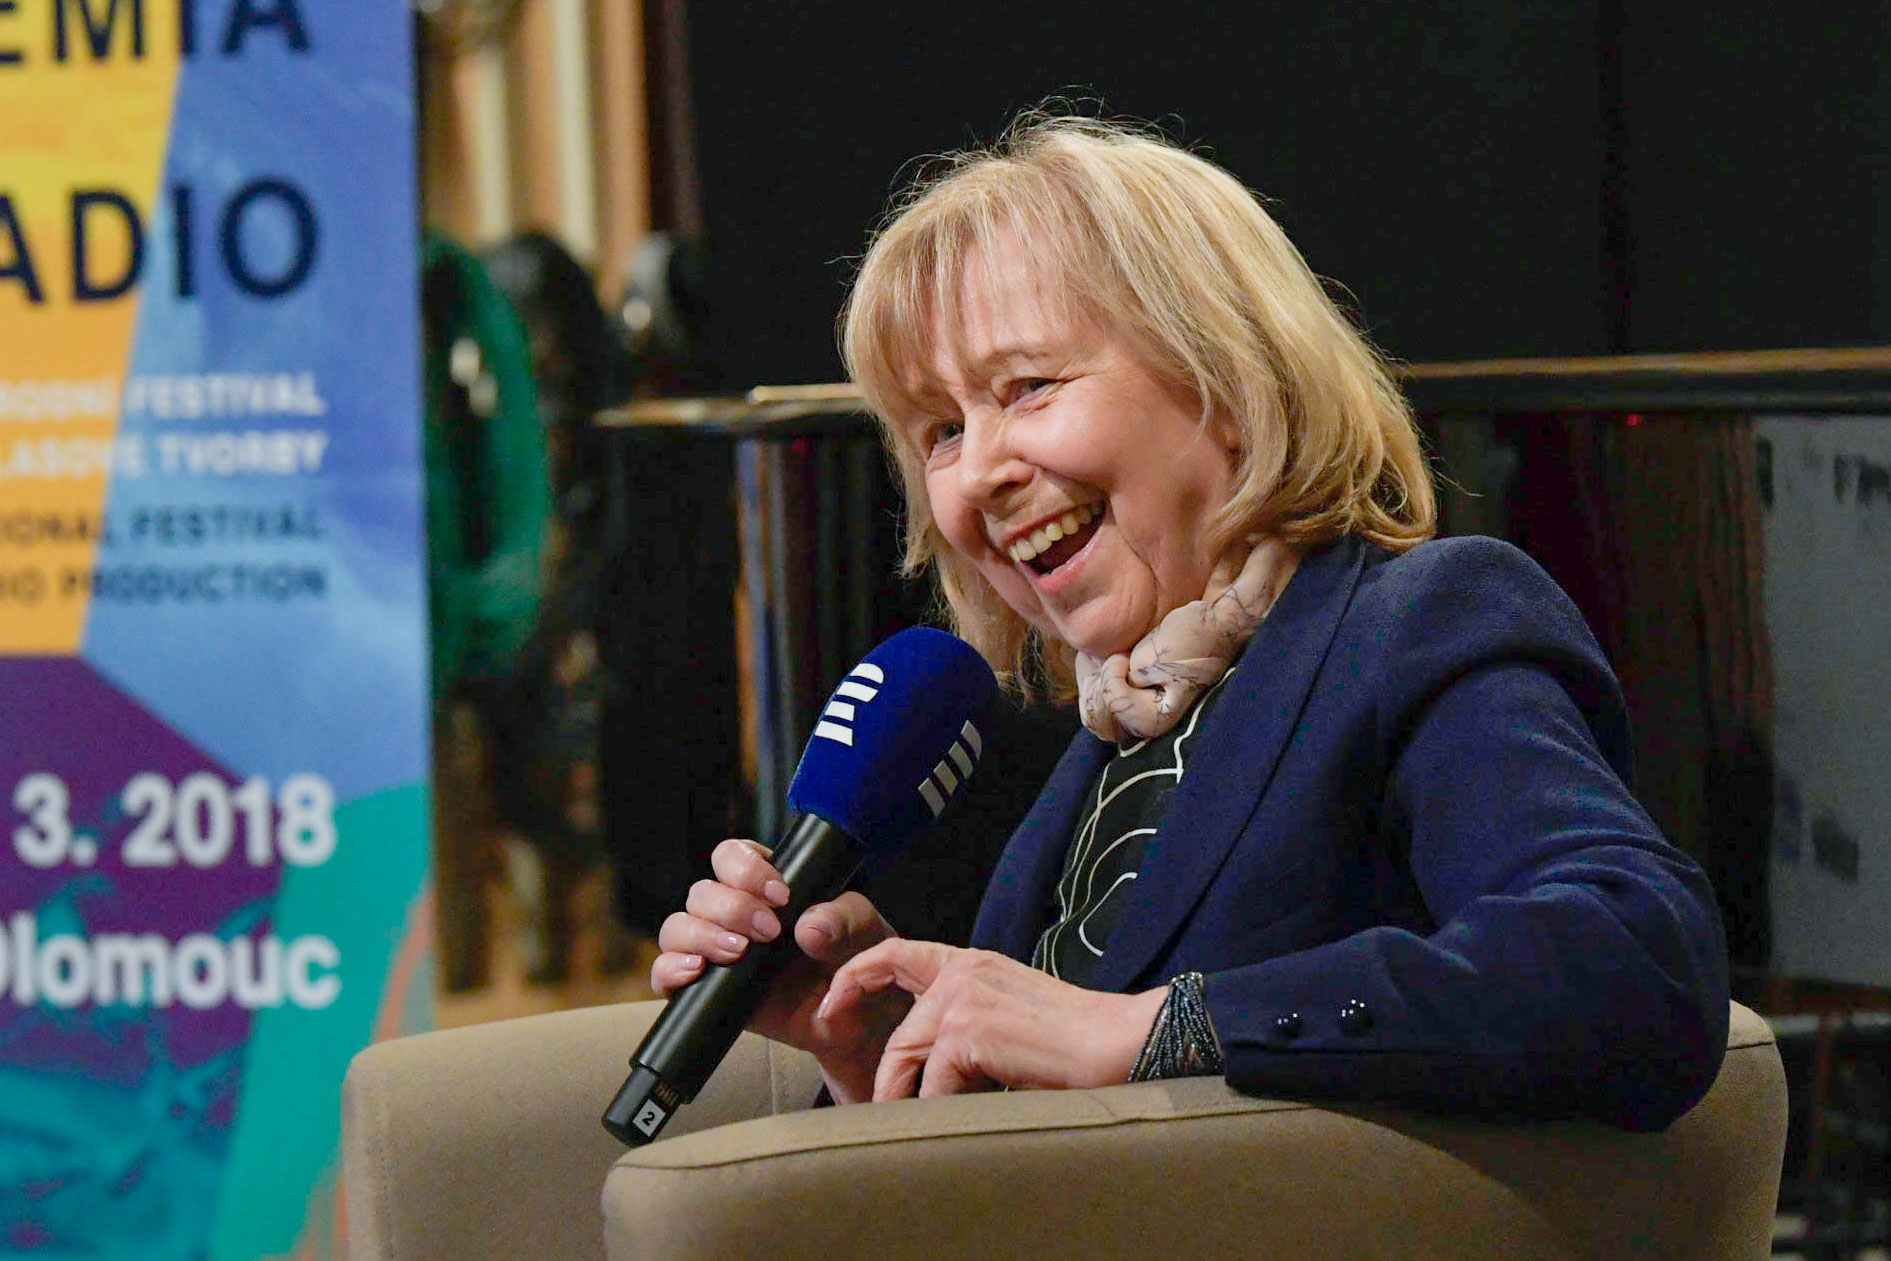 Marie Woodhamsová na festivalu Prix Bohemia Radio